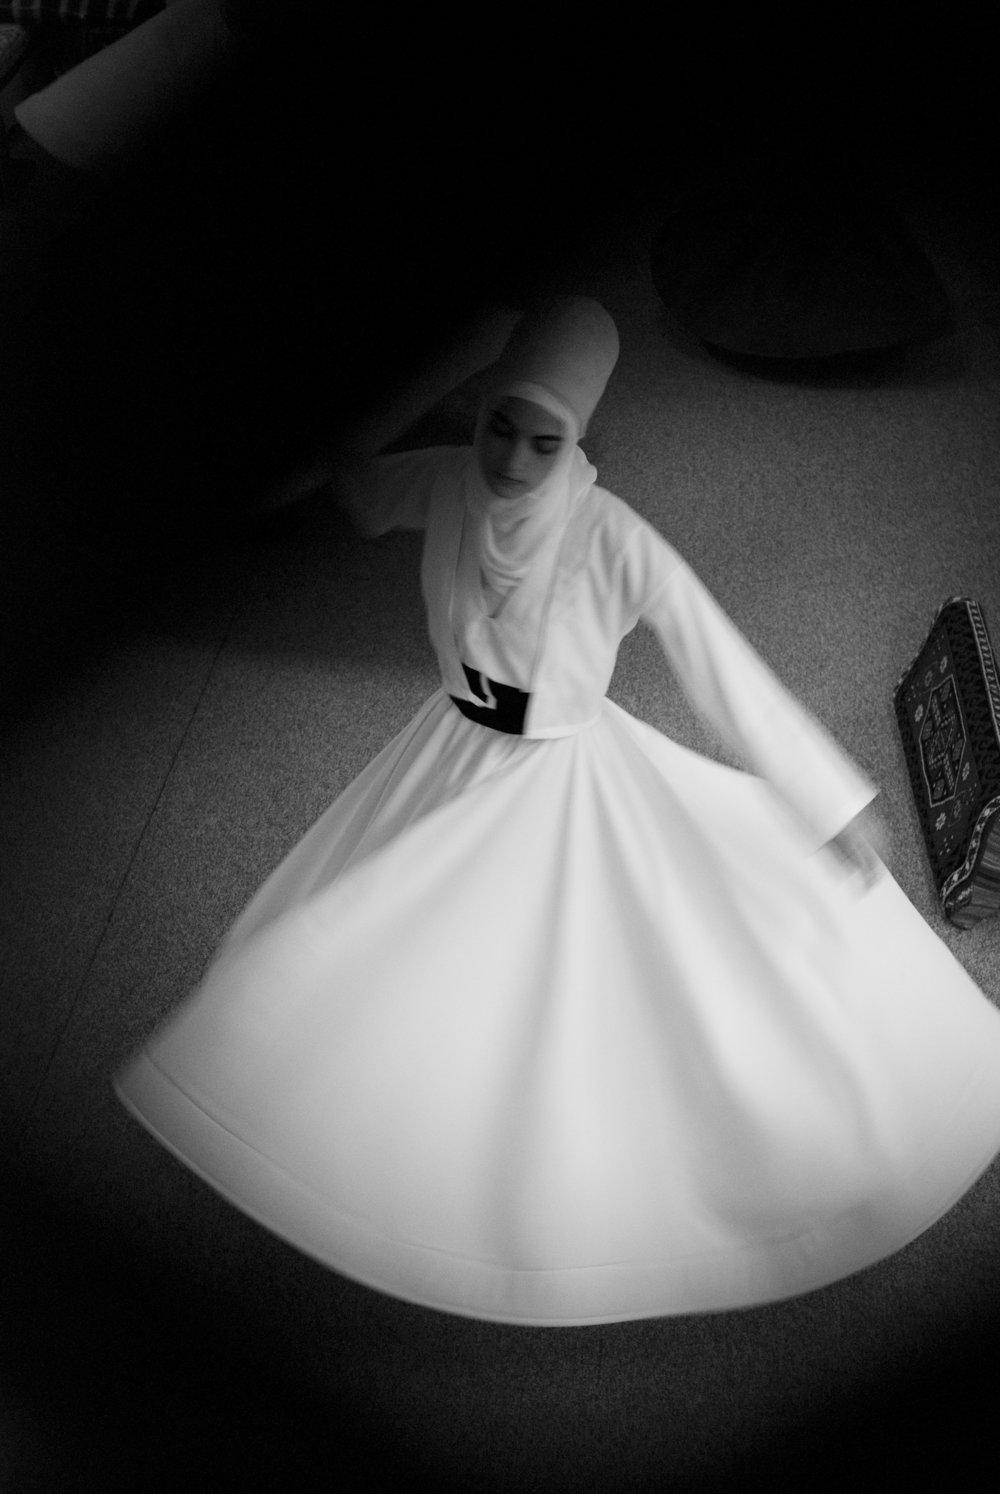 041809_SufiWomen_pi_07.JPG